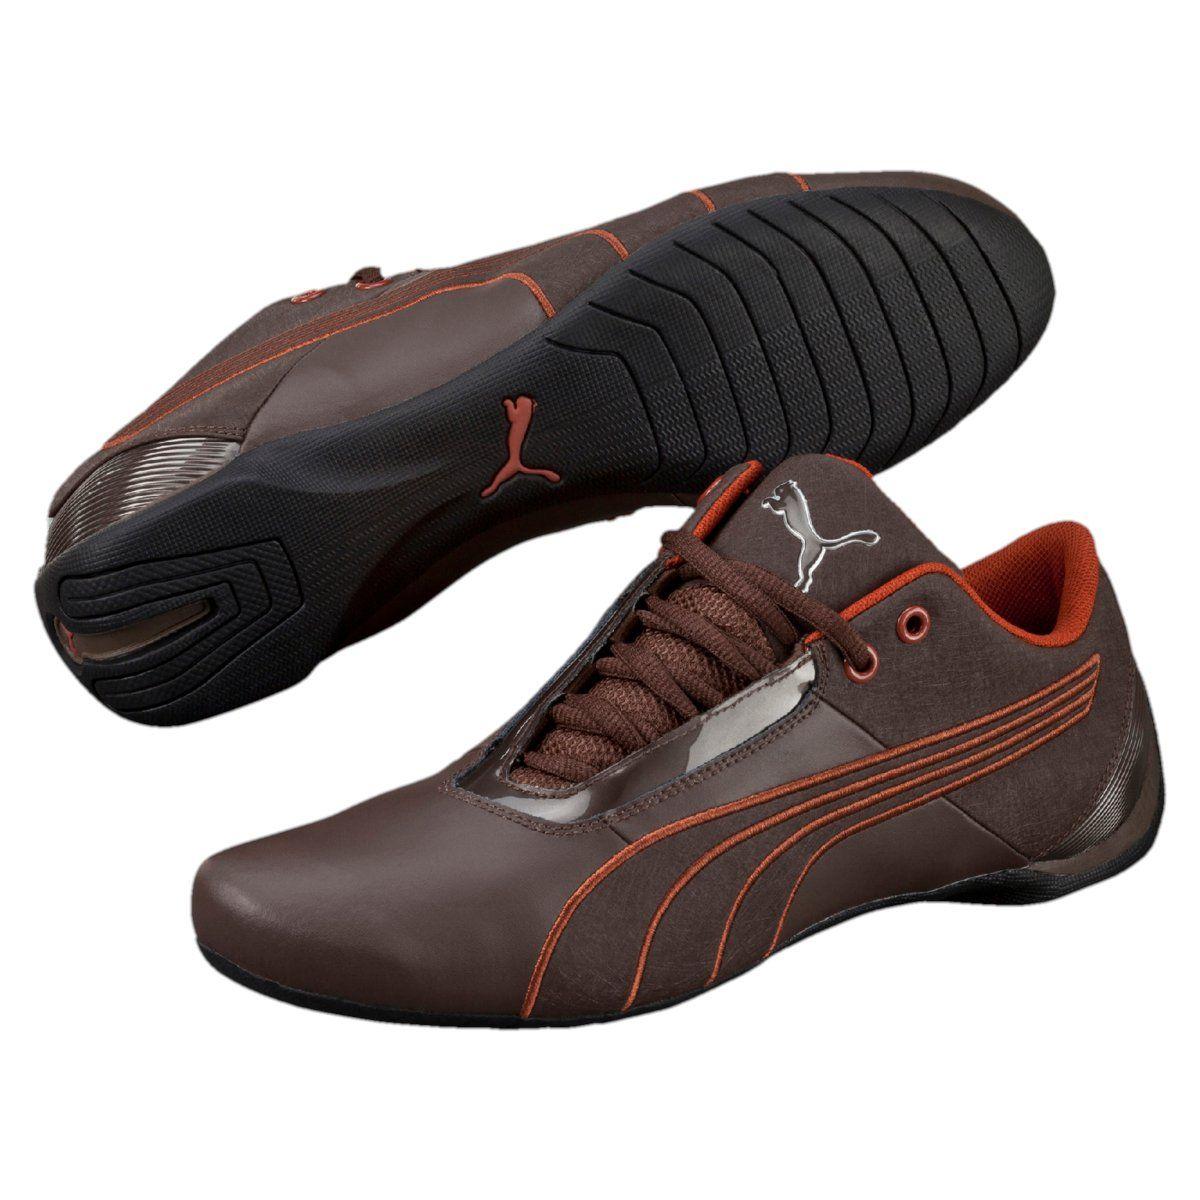 Zapato para caminar casual SF Future Cat para hombre, Puma White-Rosso Corsa-Puma White, 7 M US